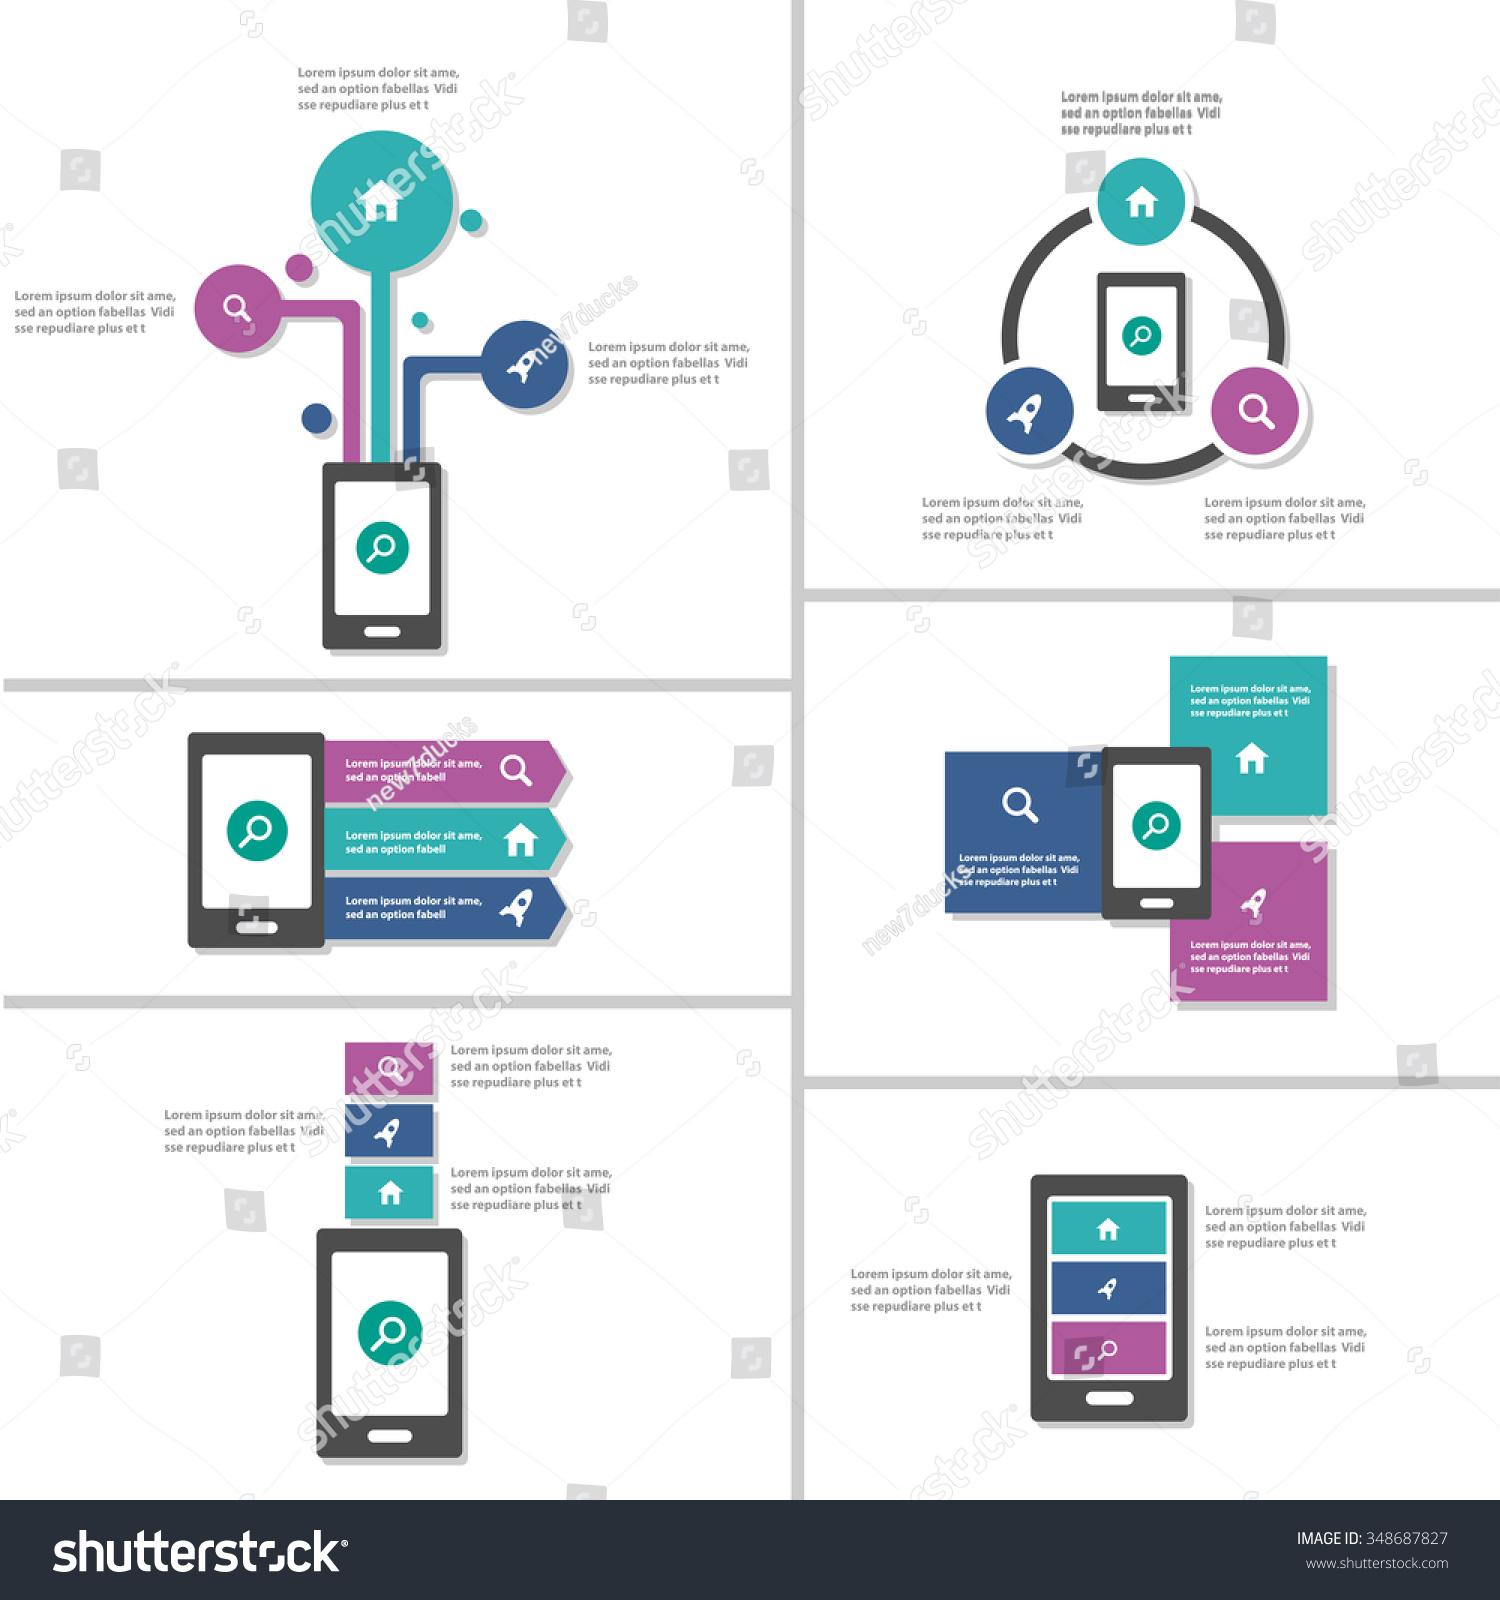 mobile phone infographic elements presentation template stock mobile phone infographic elements presentation template flat design set for brochure flyer leaflet marketing advertising